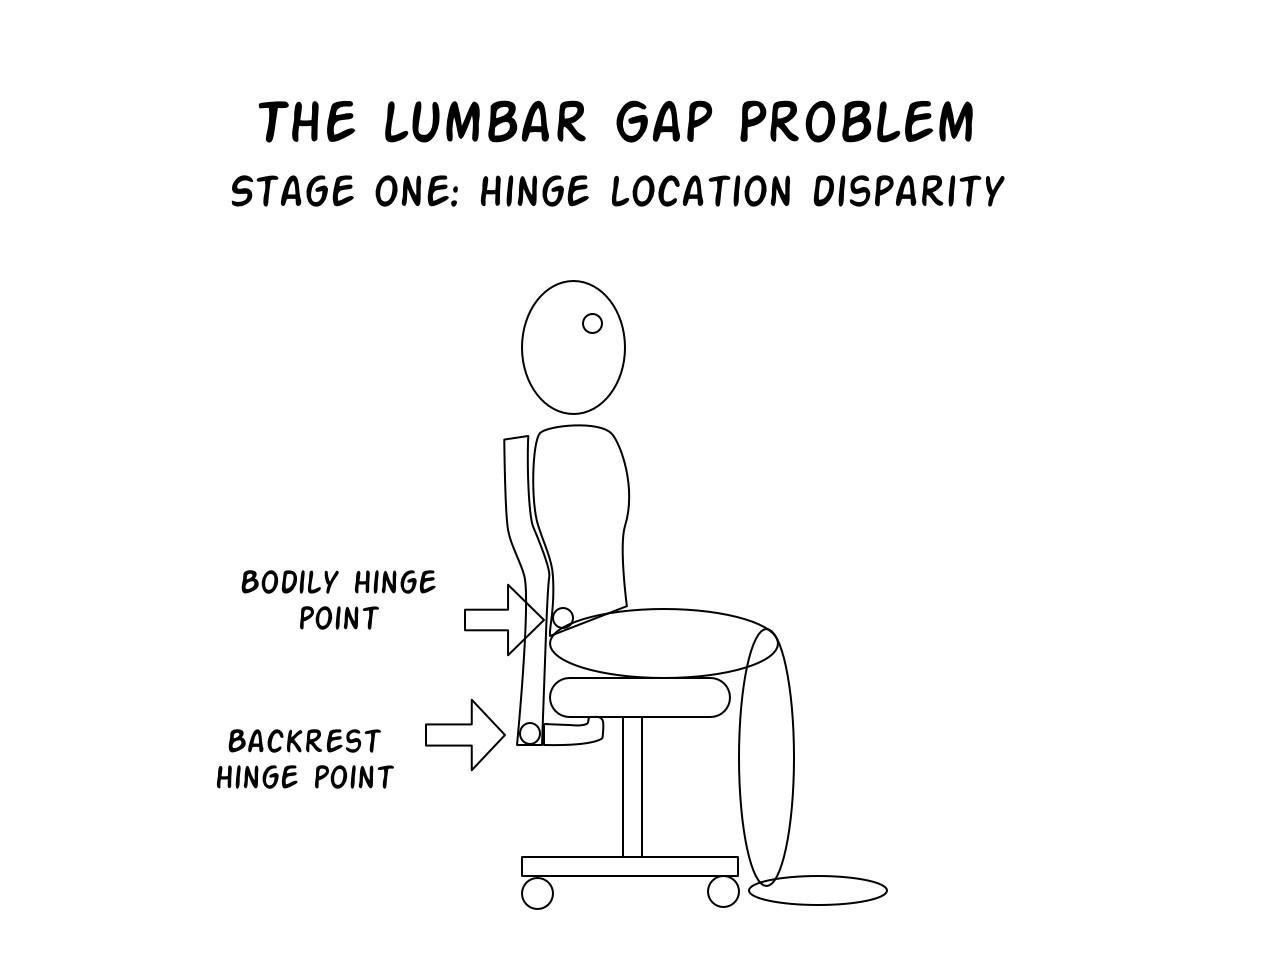 Lumbar Gap Problem stage 1